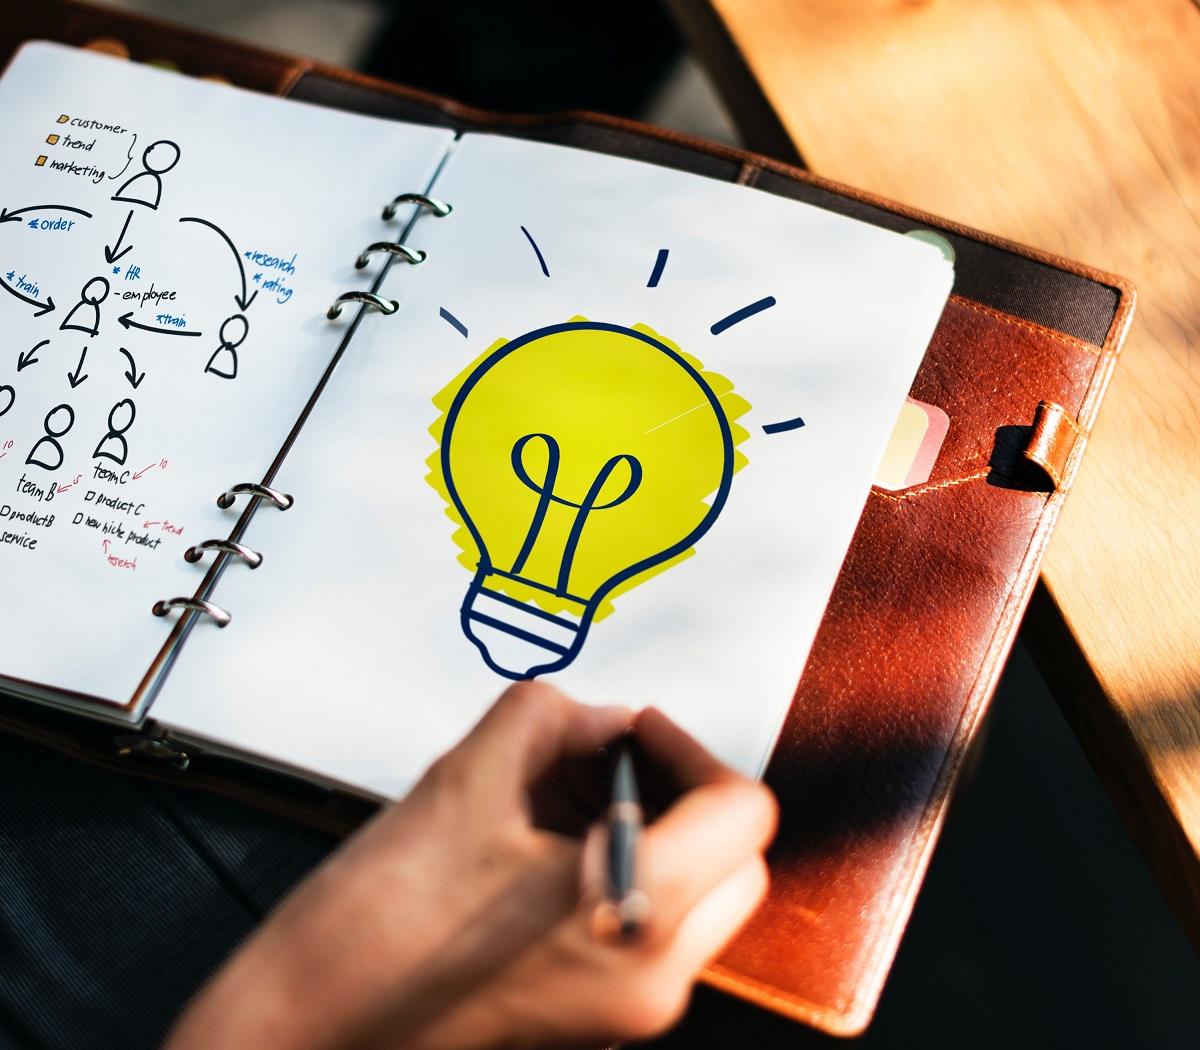 Creative mind writing an idea